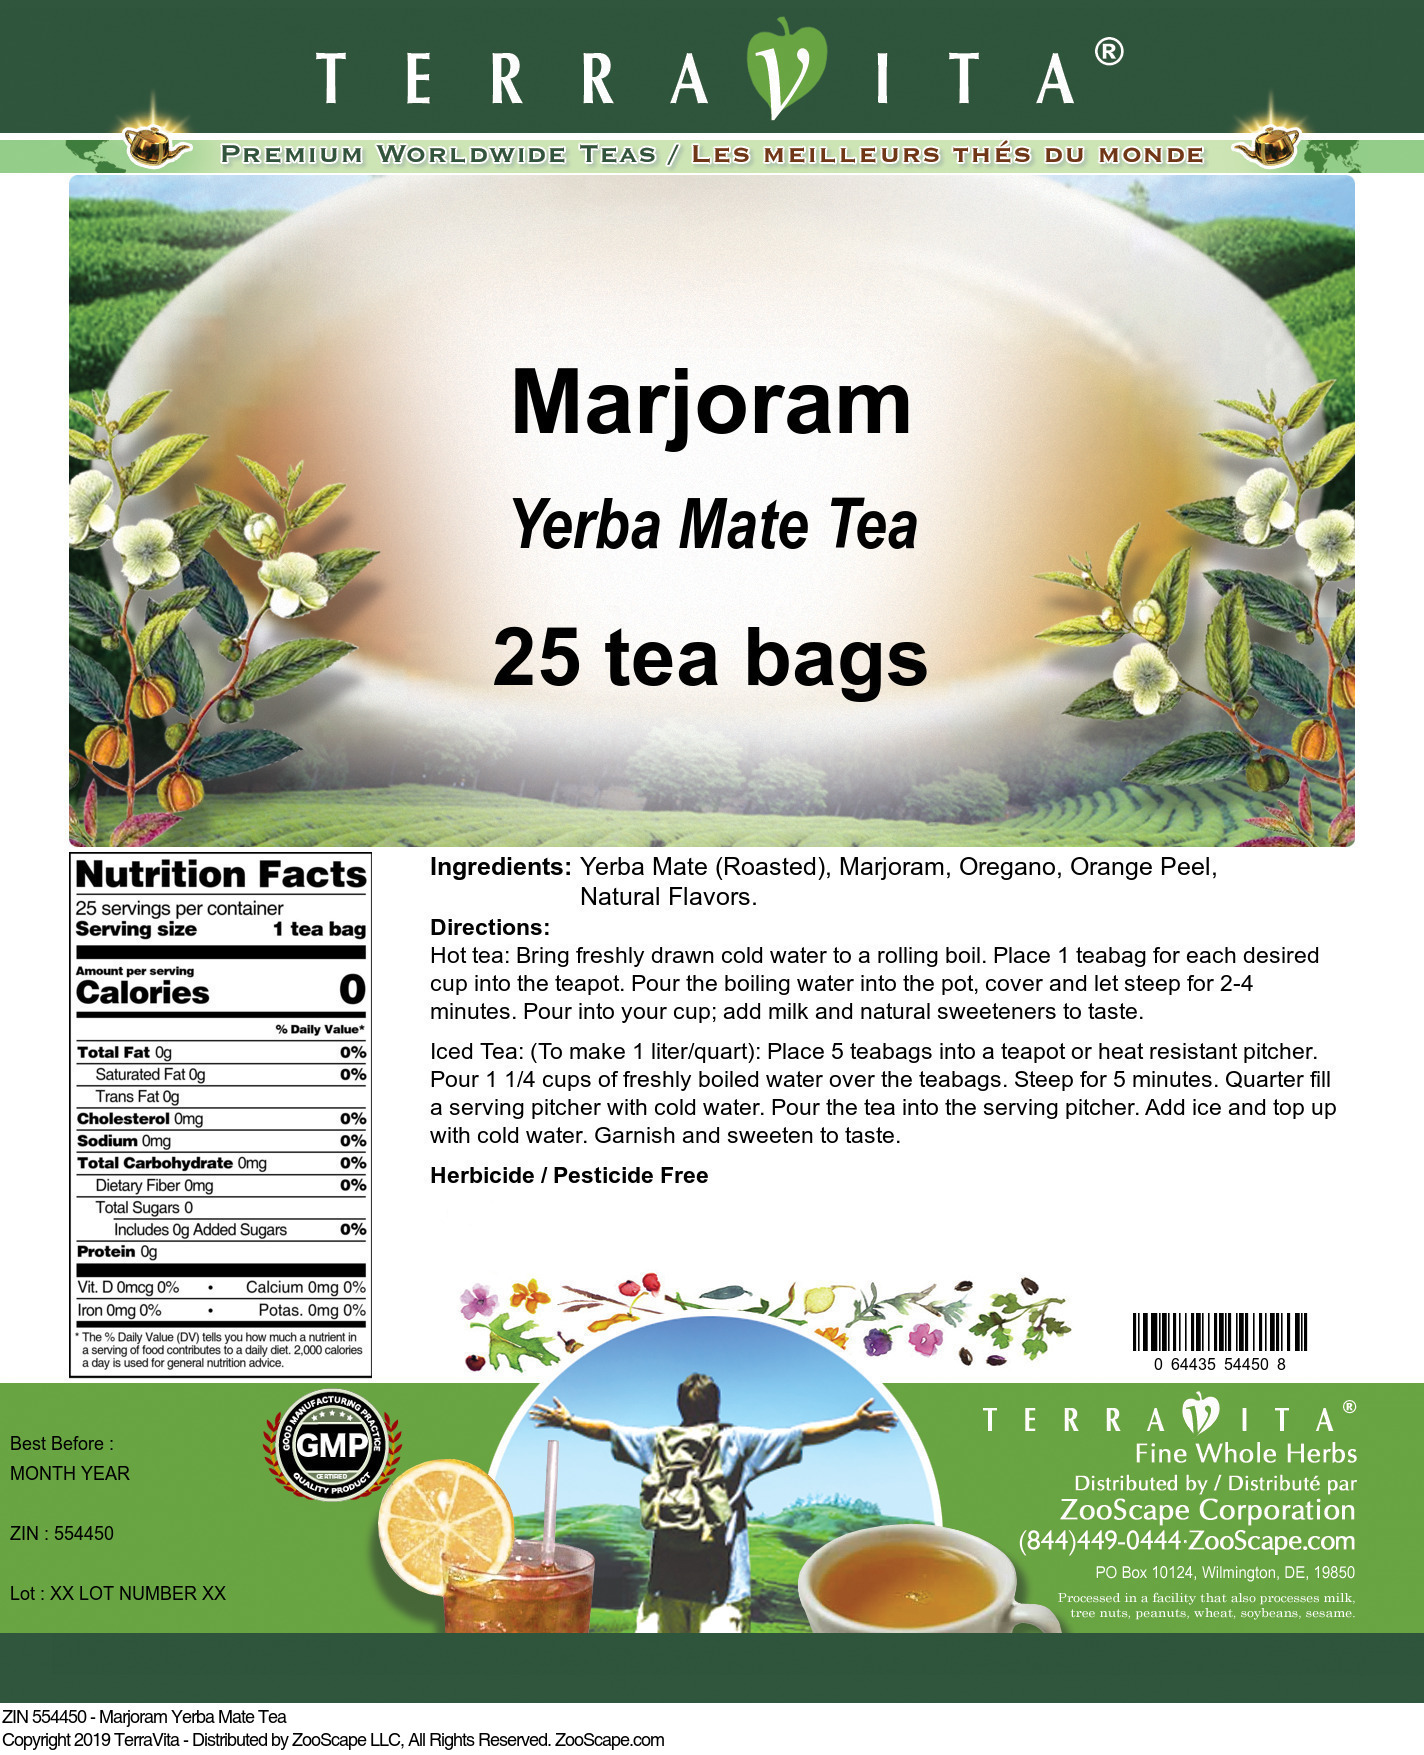 Marjoram Yerba Mate Tea